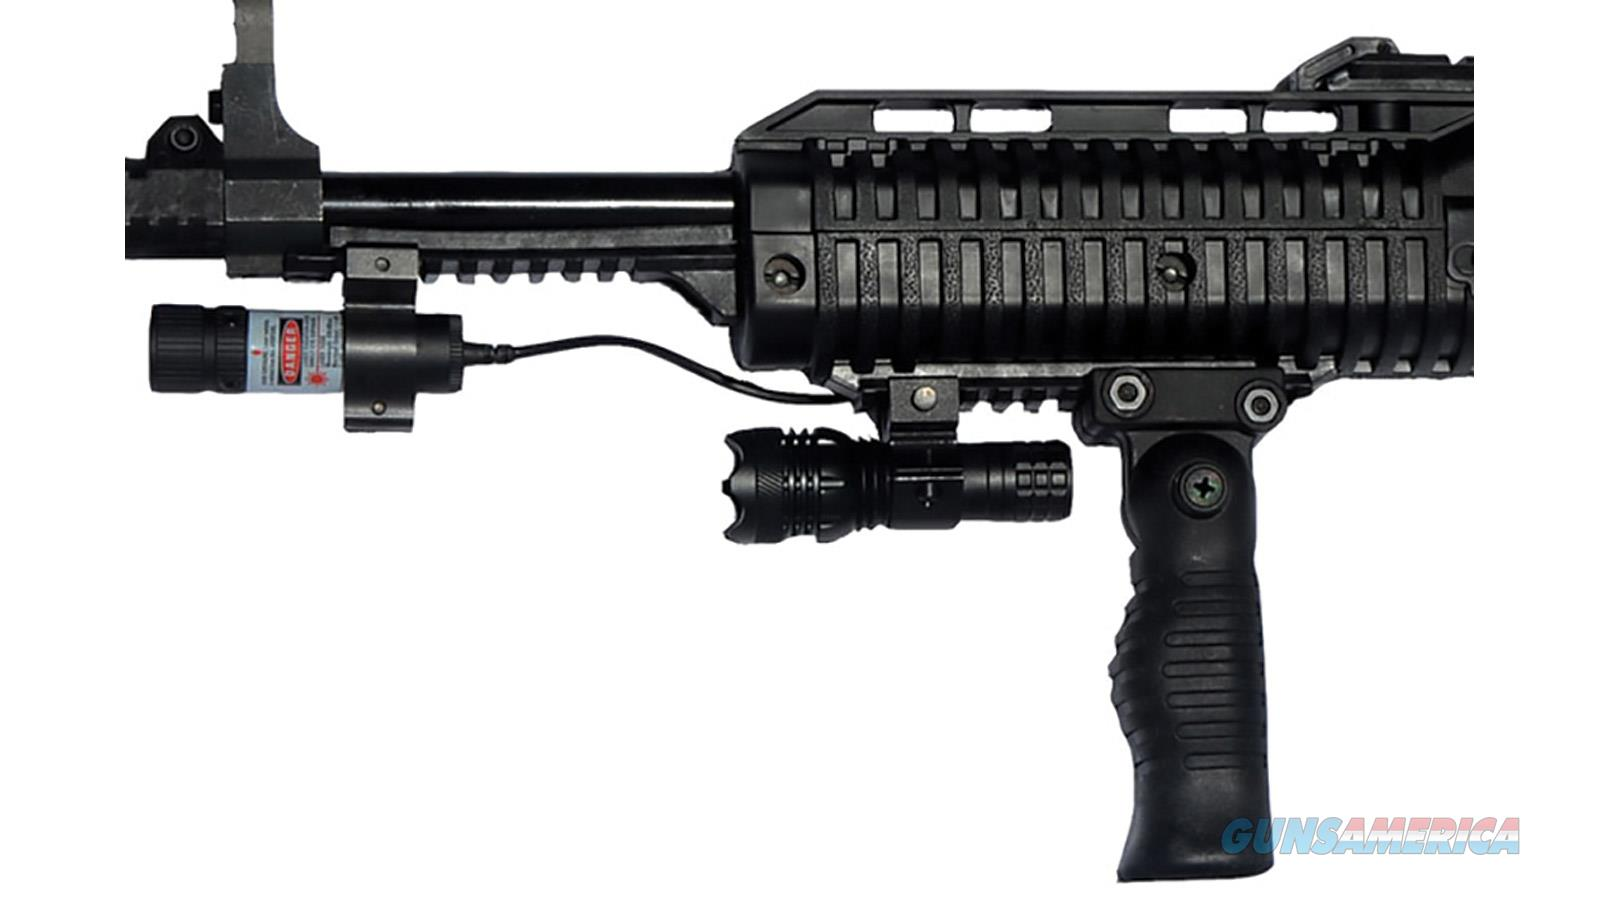 Hipoint 45Ts Semi-Auto Carbine 45 Acp, Rh, 17.5 In, Blk, Plmr Stock, 9+1 Rnd, W/Fwd Grip 4595TS FG FL LAS  Guns > Rifles > H Misc Rifles